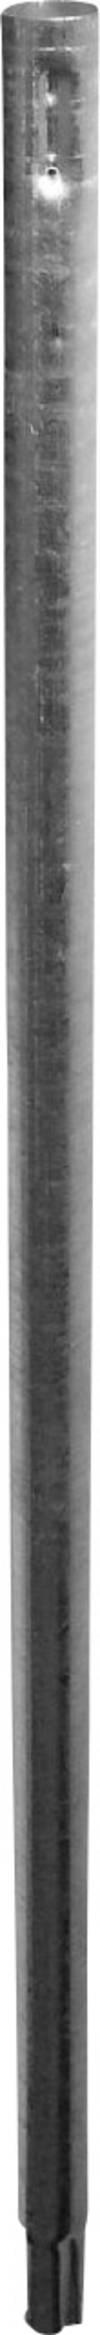 Steckmast A.S. SAT 36151 Silber